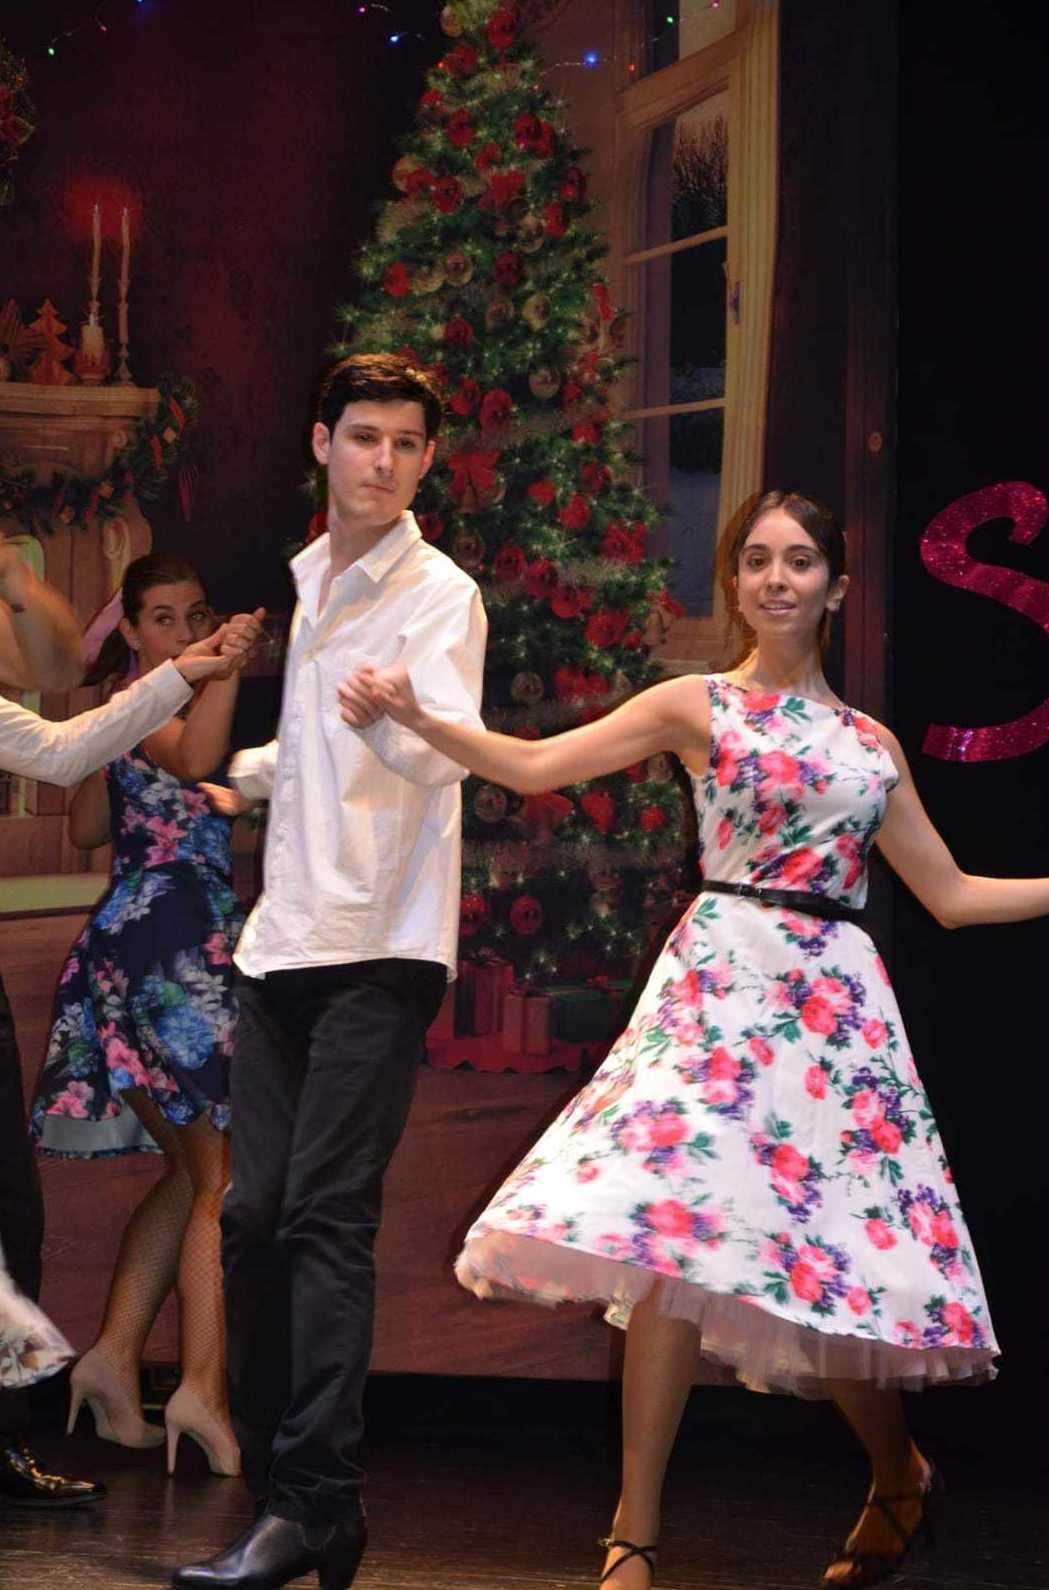 Foto 11 de Academia de danza en  | Academia de Danza Sonia